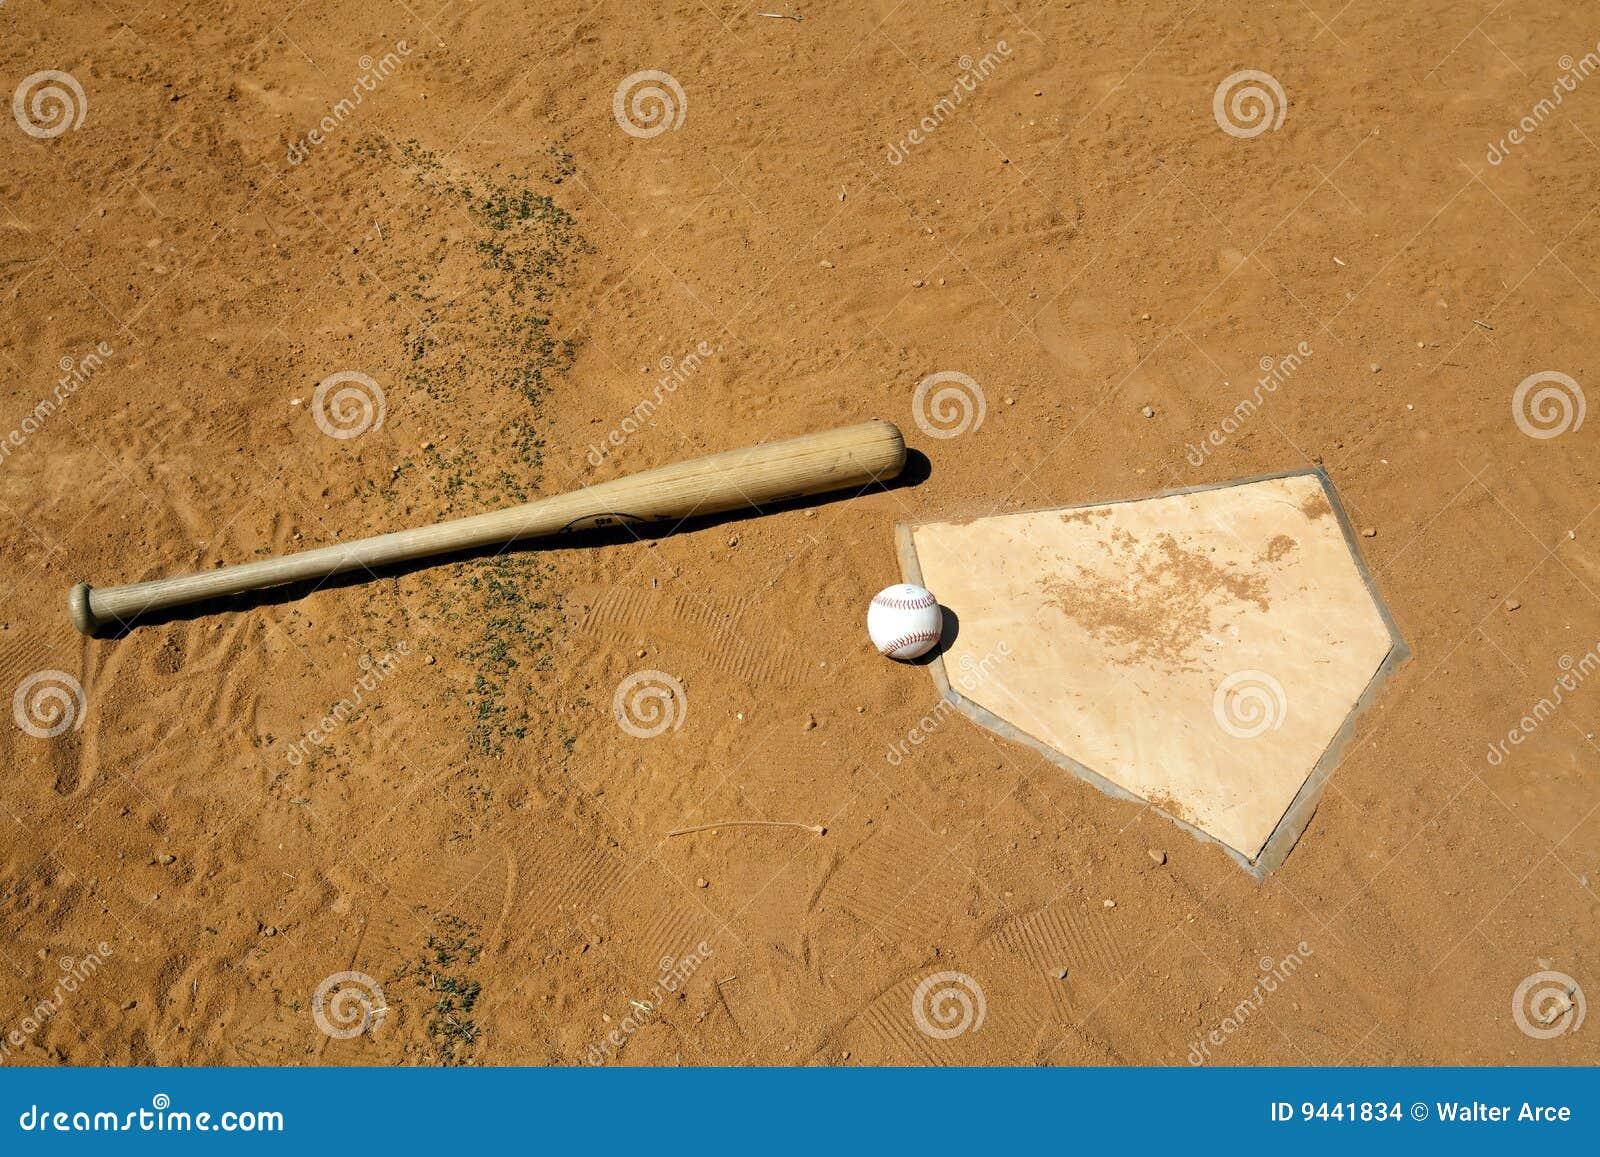 Baseball and Bat on Home Plate